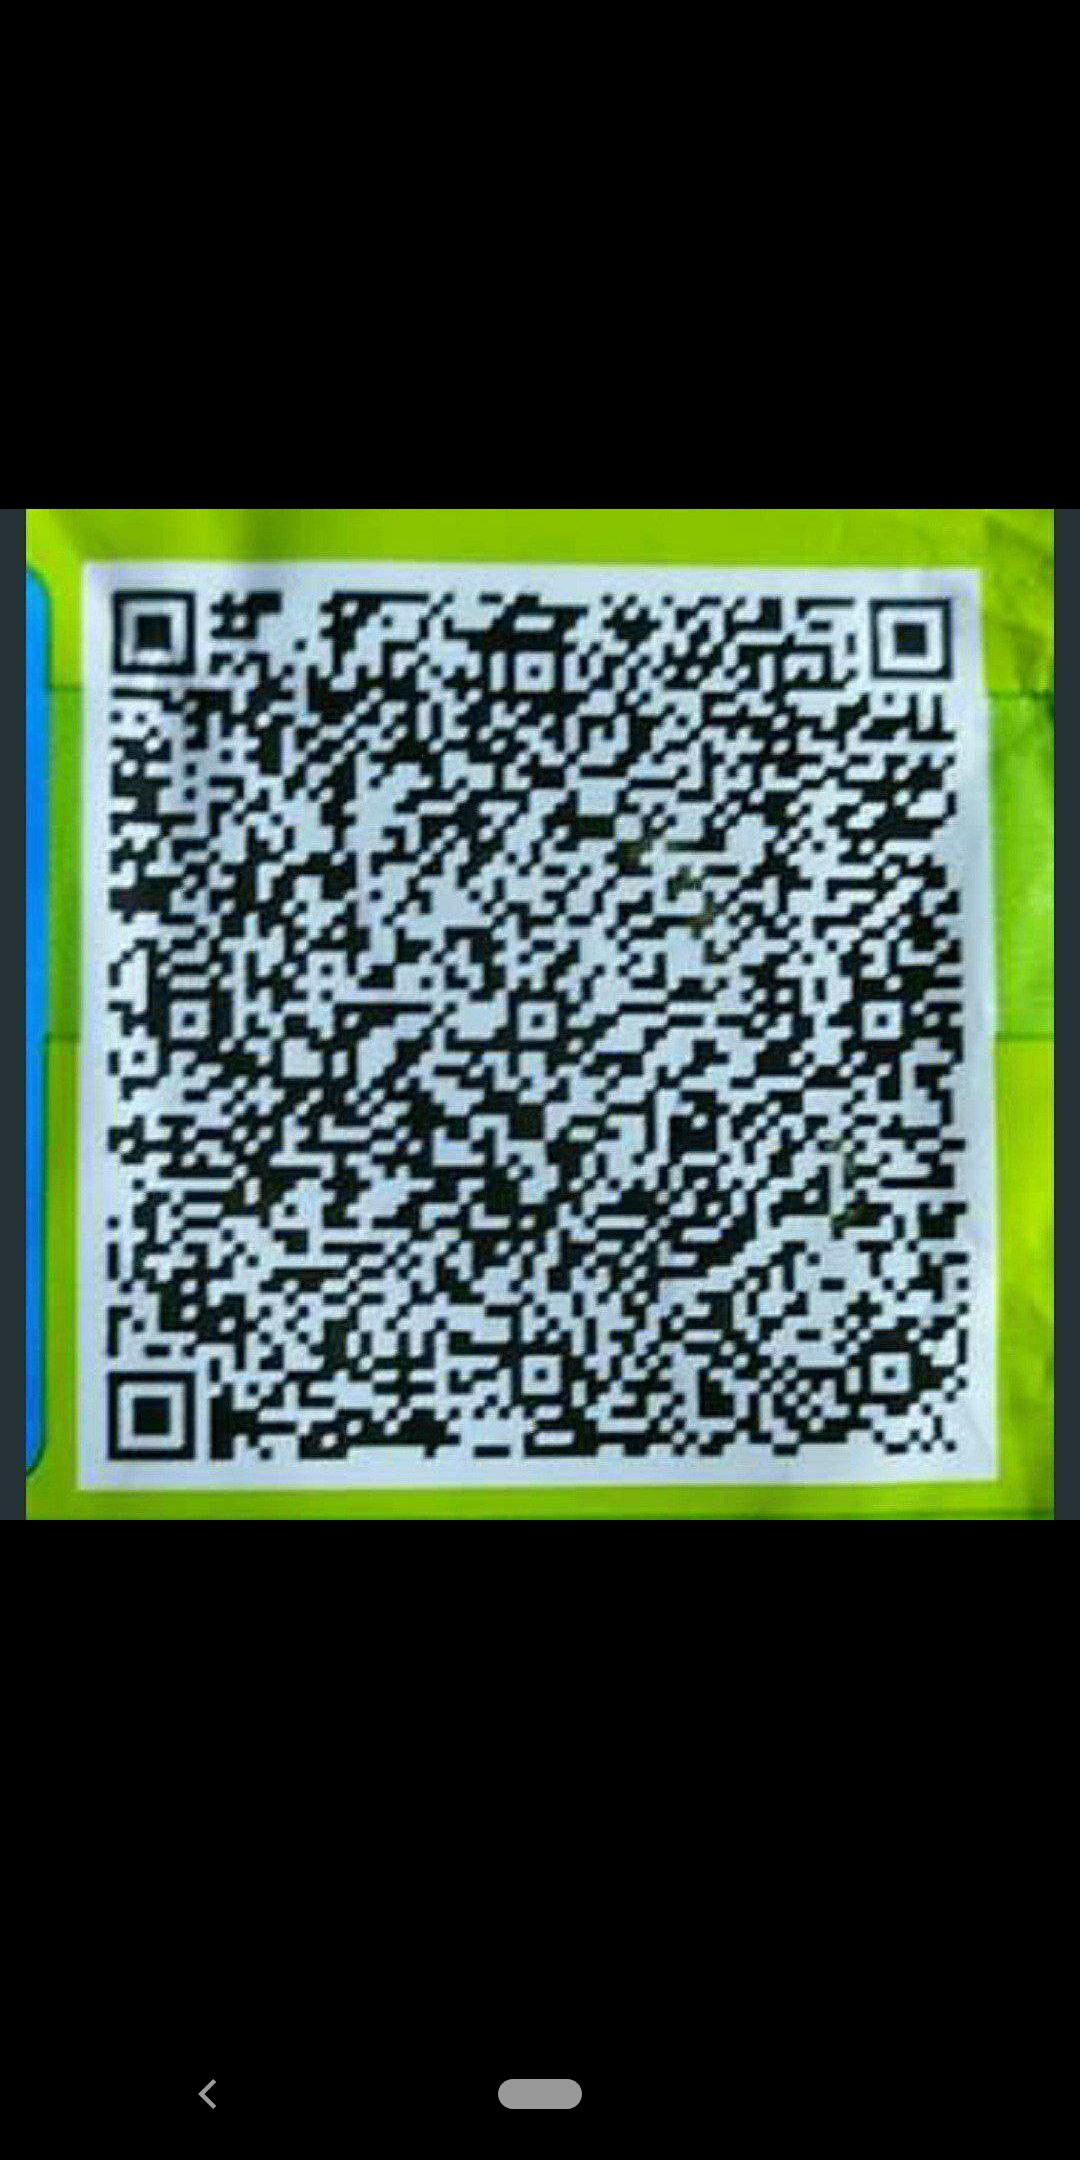 https://cdn0.desidime.com/attachments/photos/663957/original/Screenshot_20210207-070026.png?1612661512